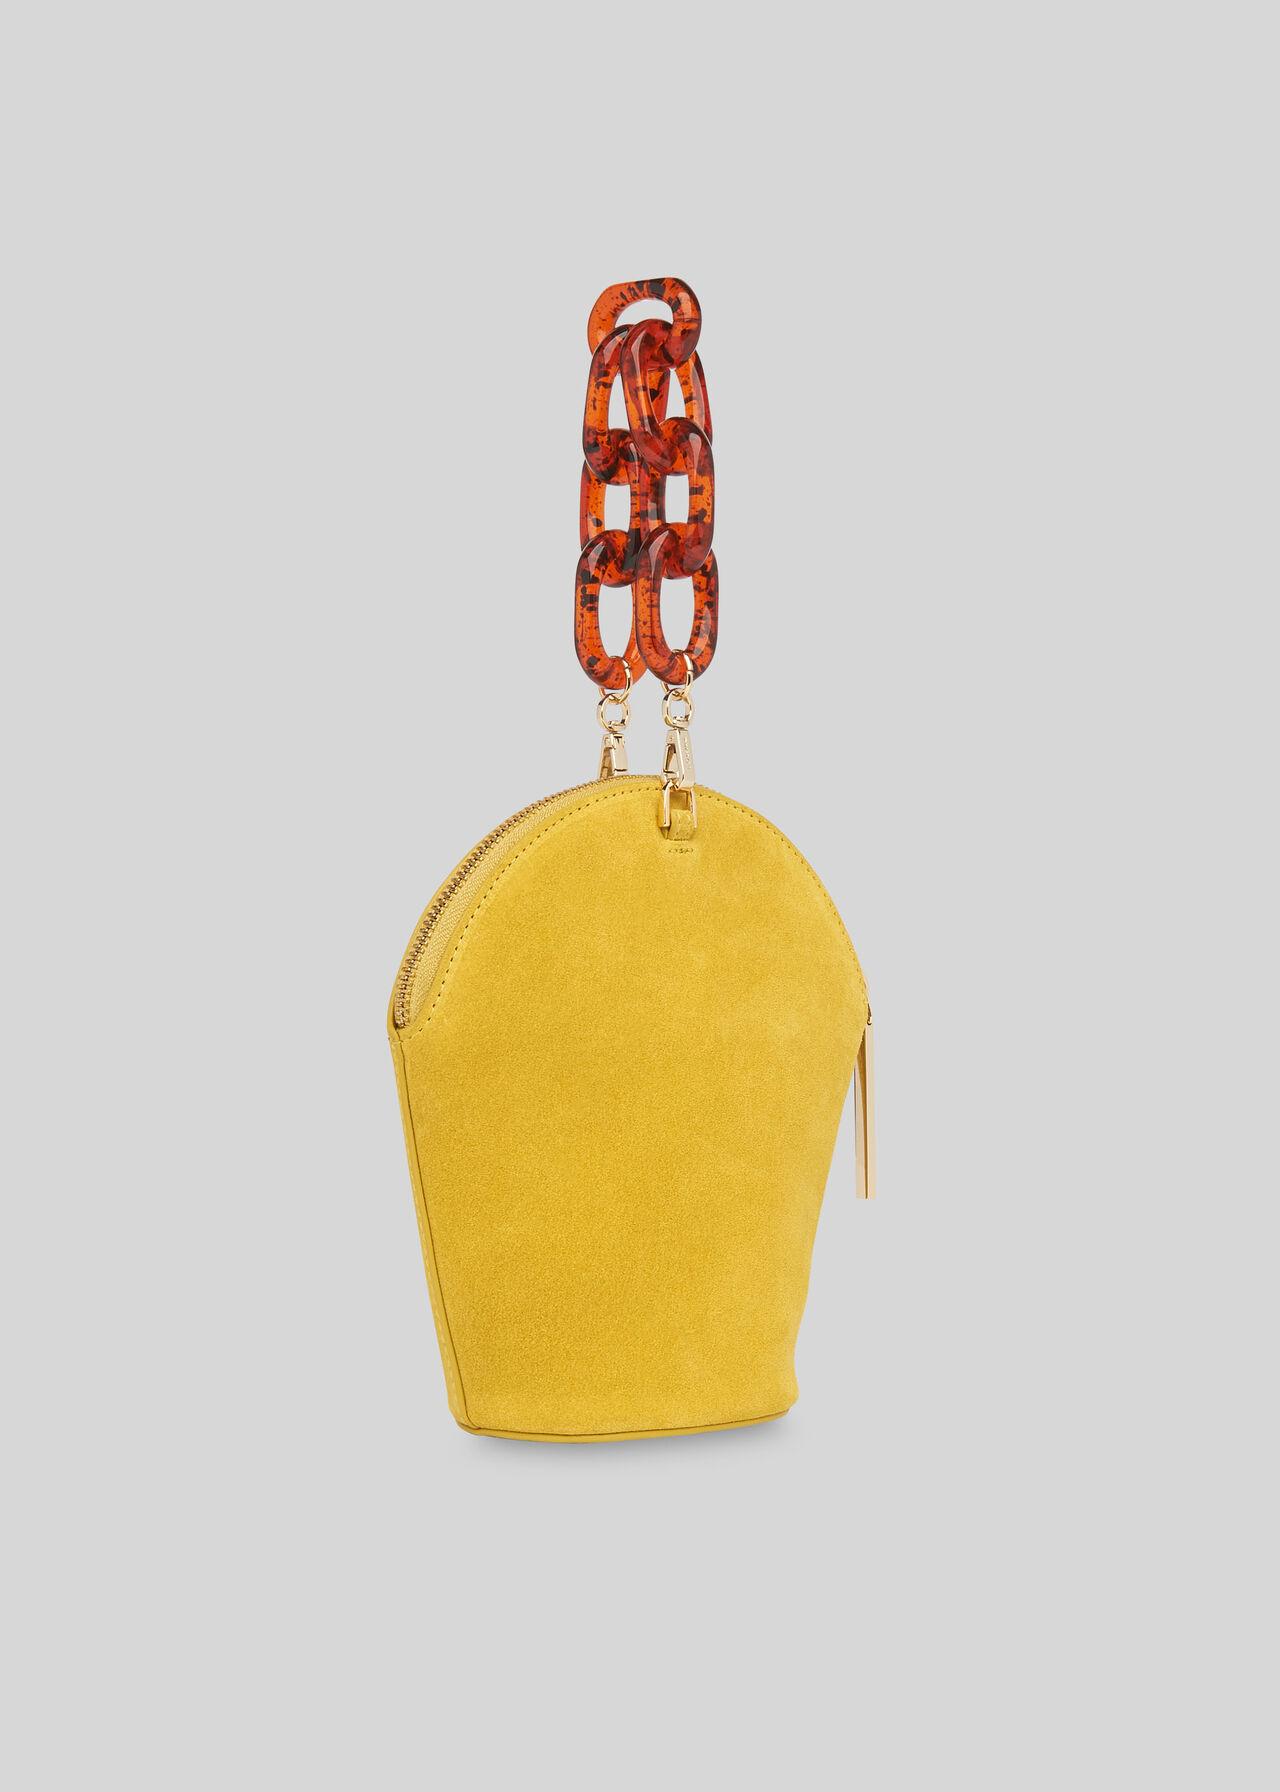 Resin Chain Leonard Wristlet Yellow